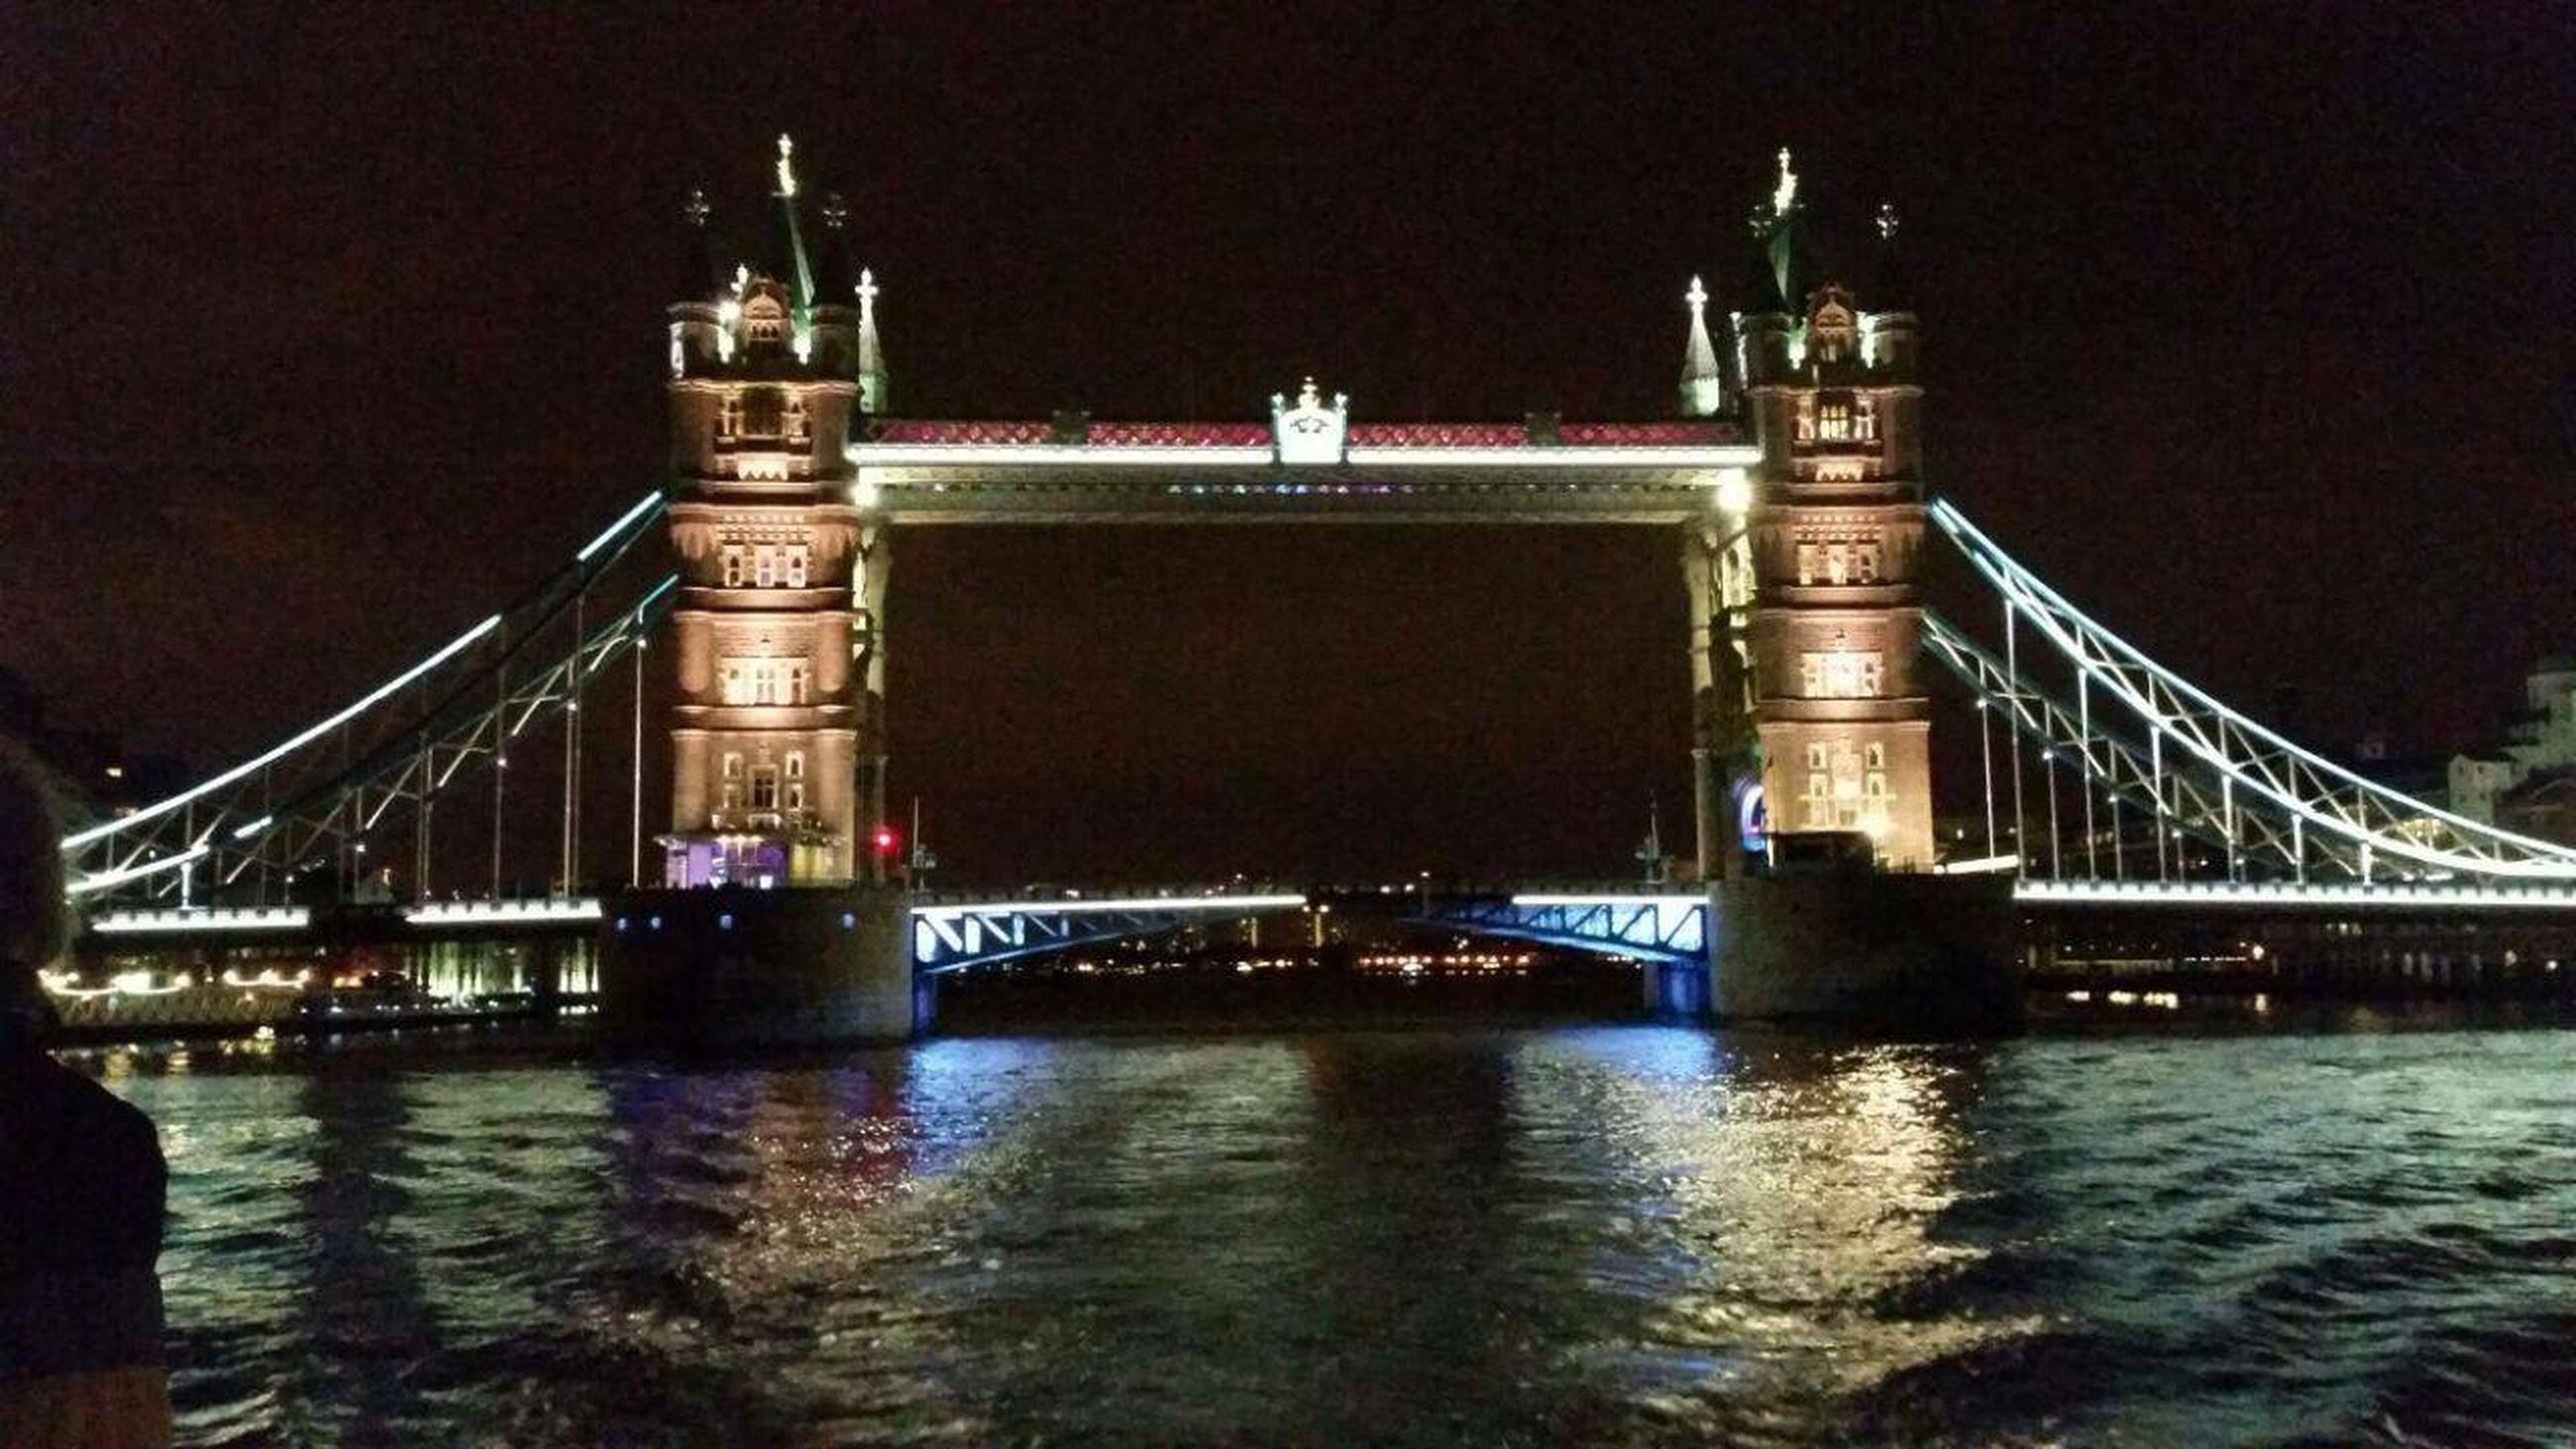 EyeEmNewHere London tower bridge love my city EyeEmNewHere